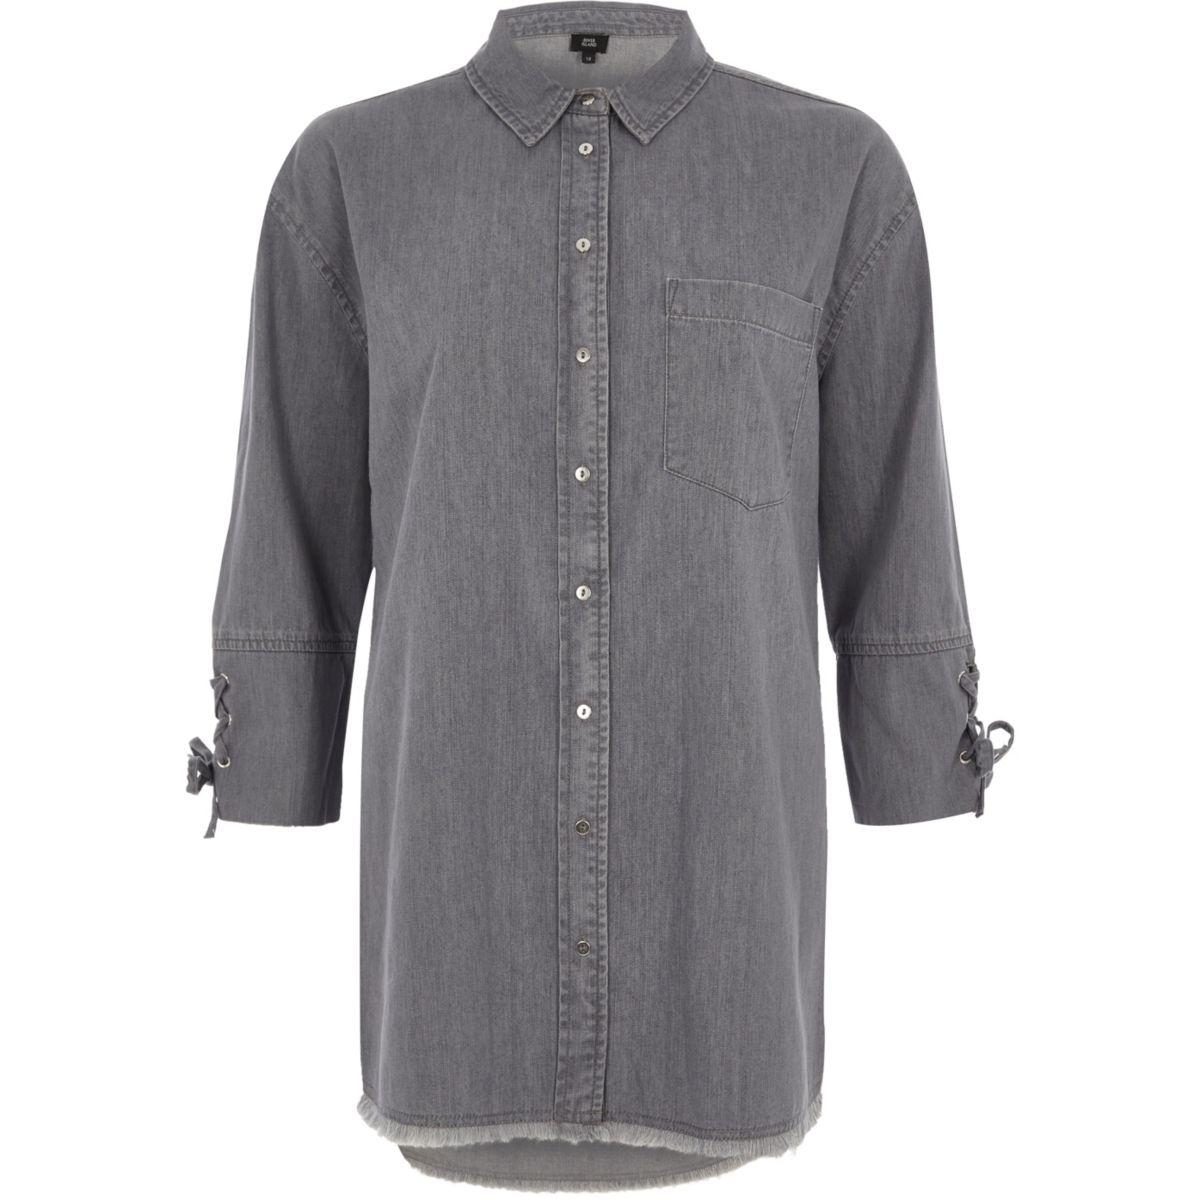 Grey tie cuff denim shirt